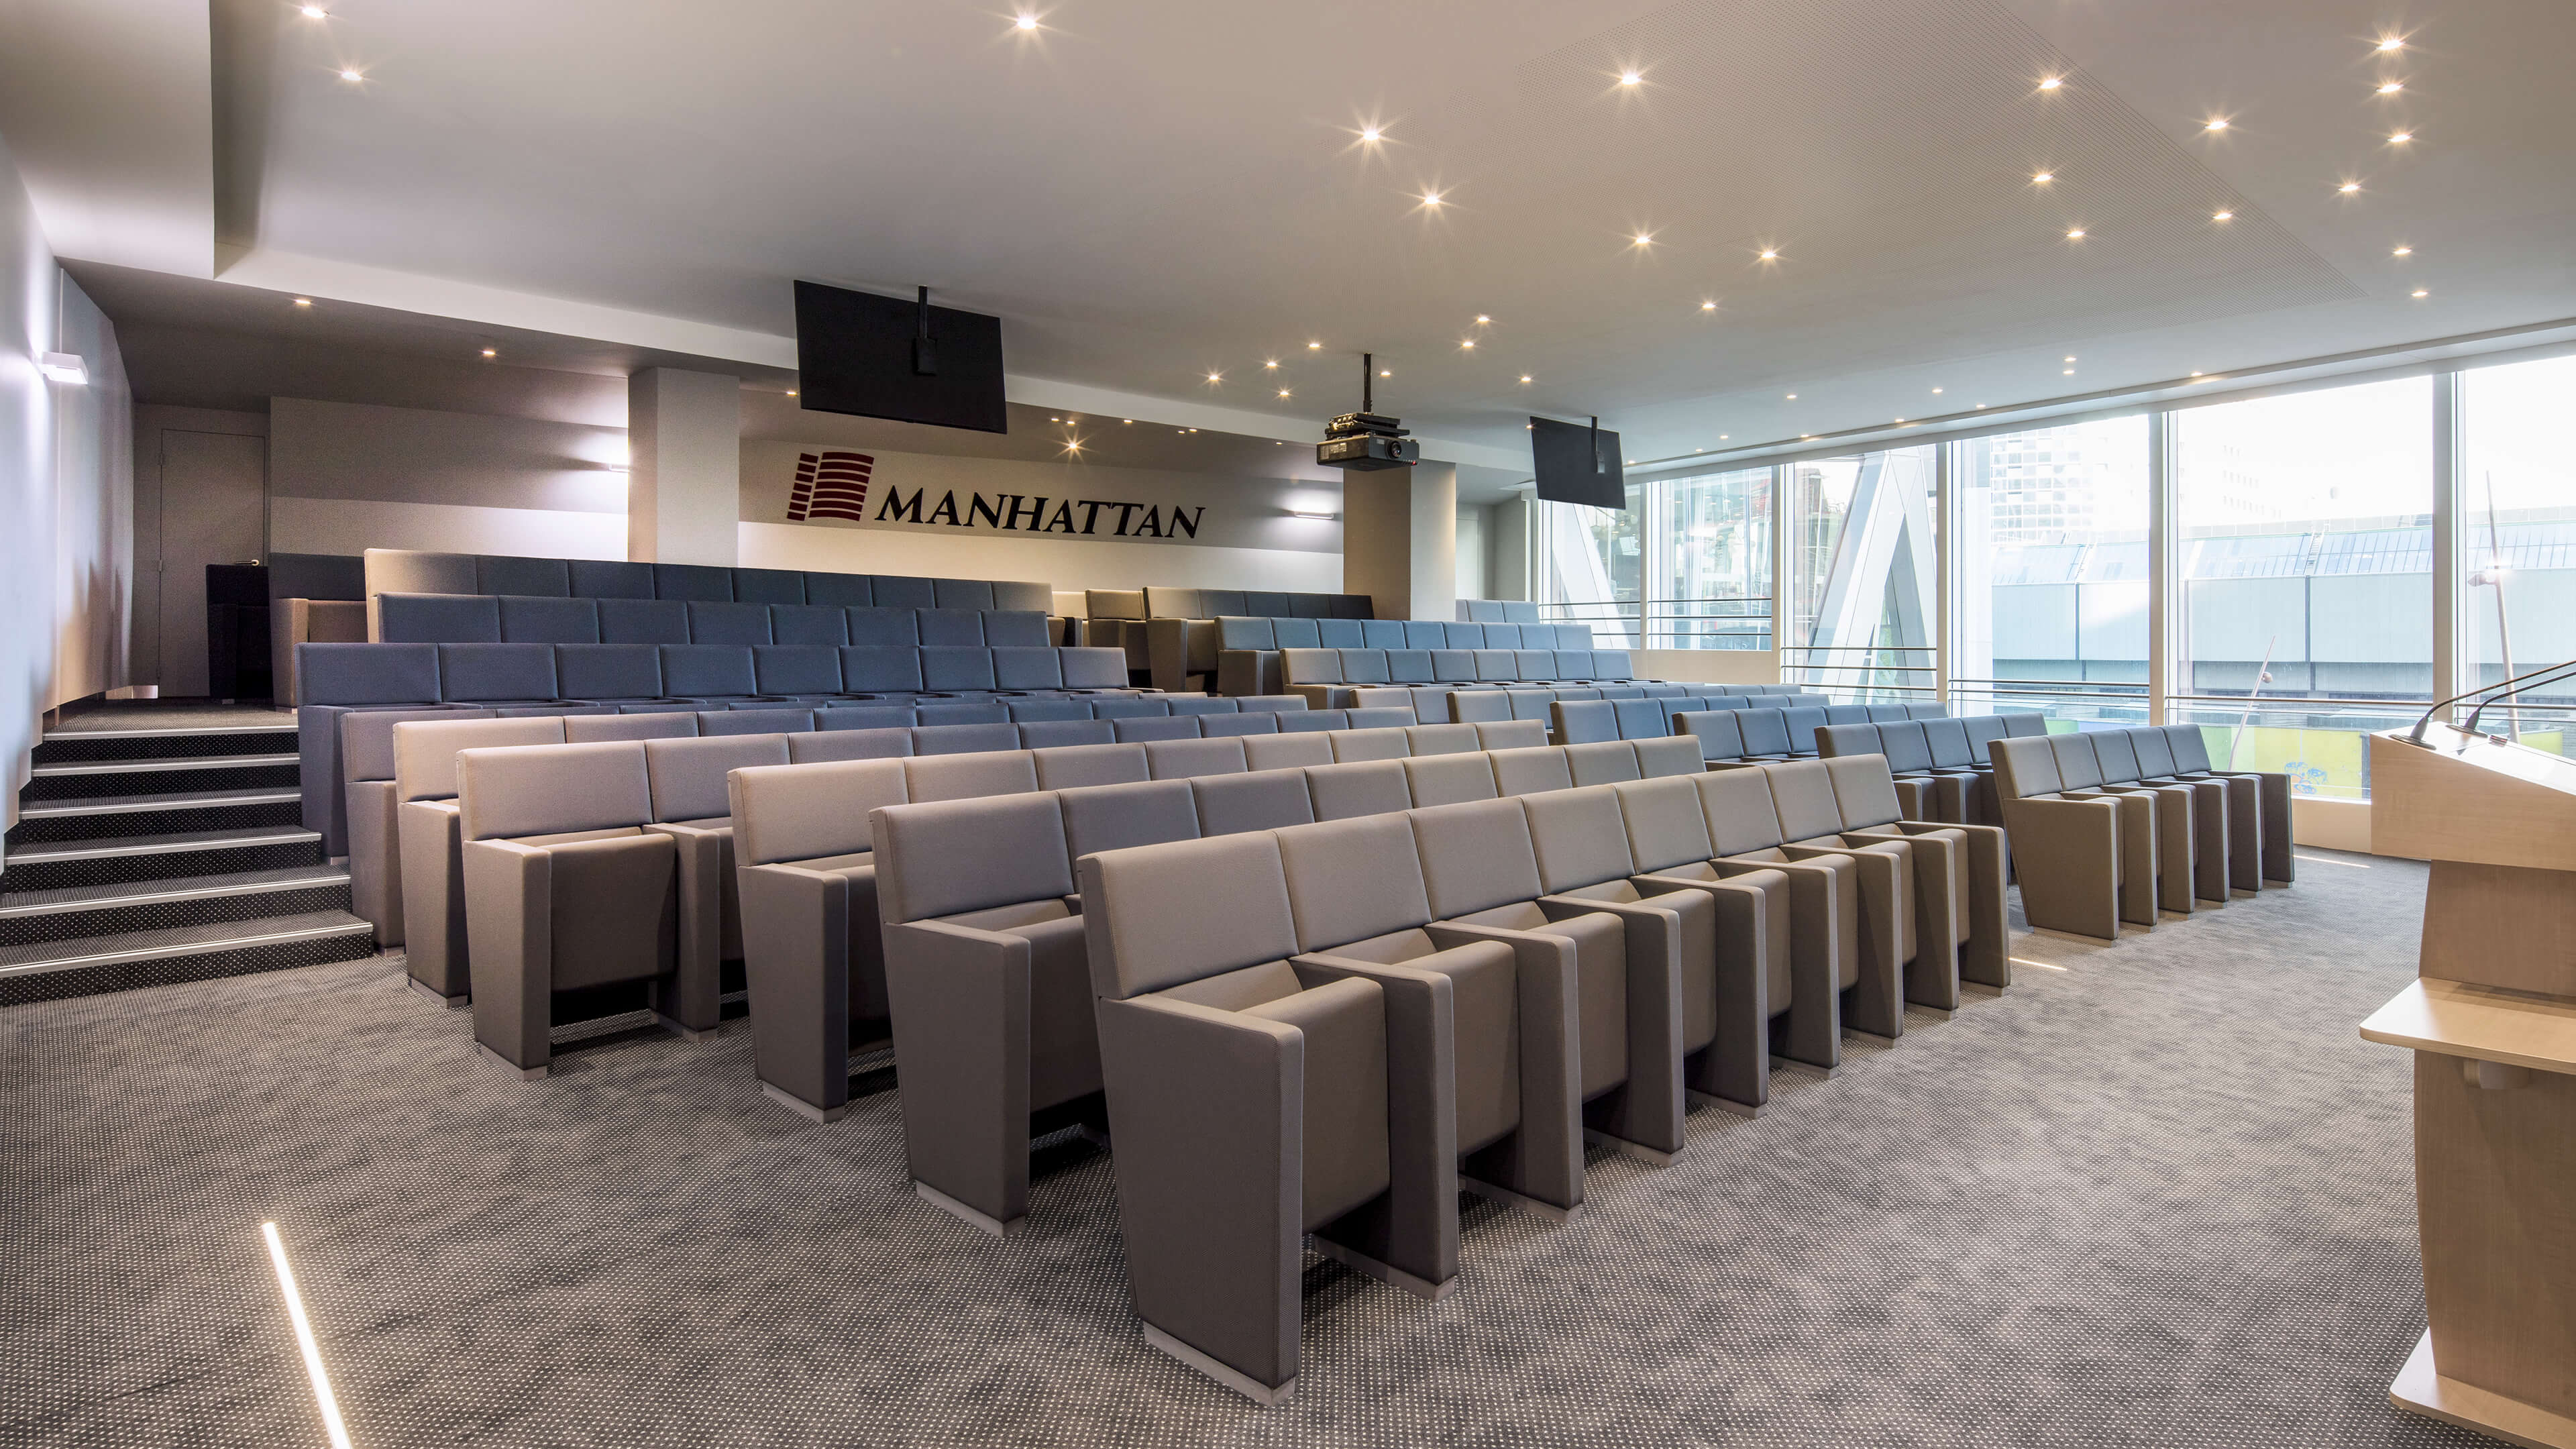 Tour Manhattan - L213 armchairs by LAMM